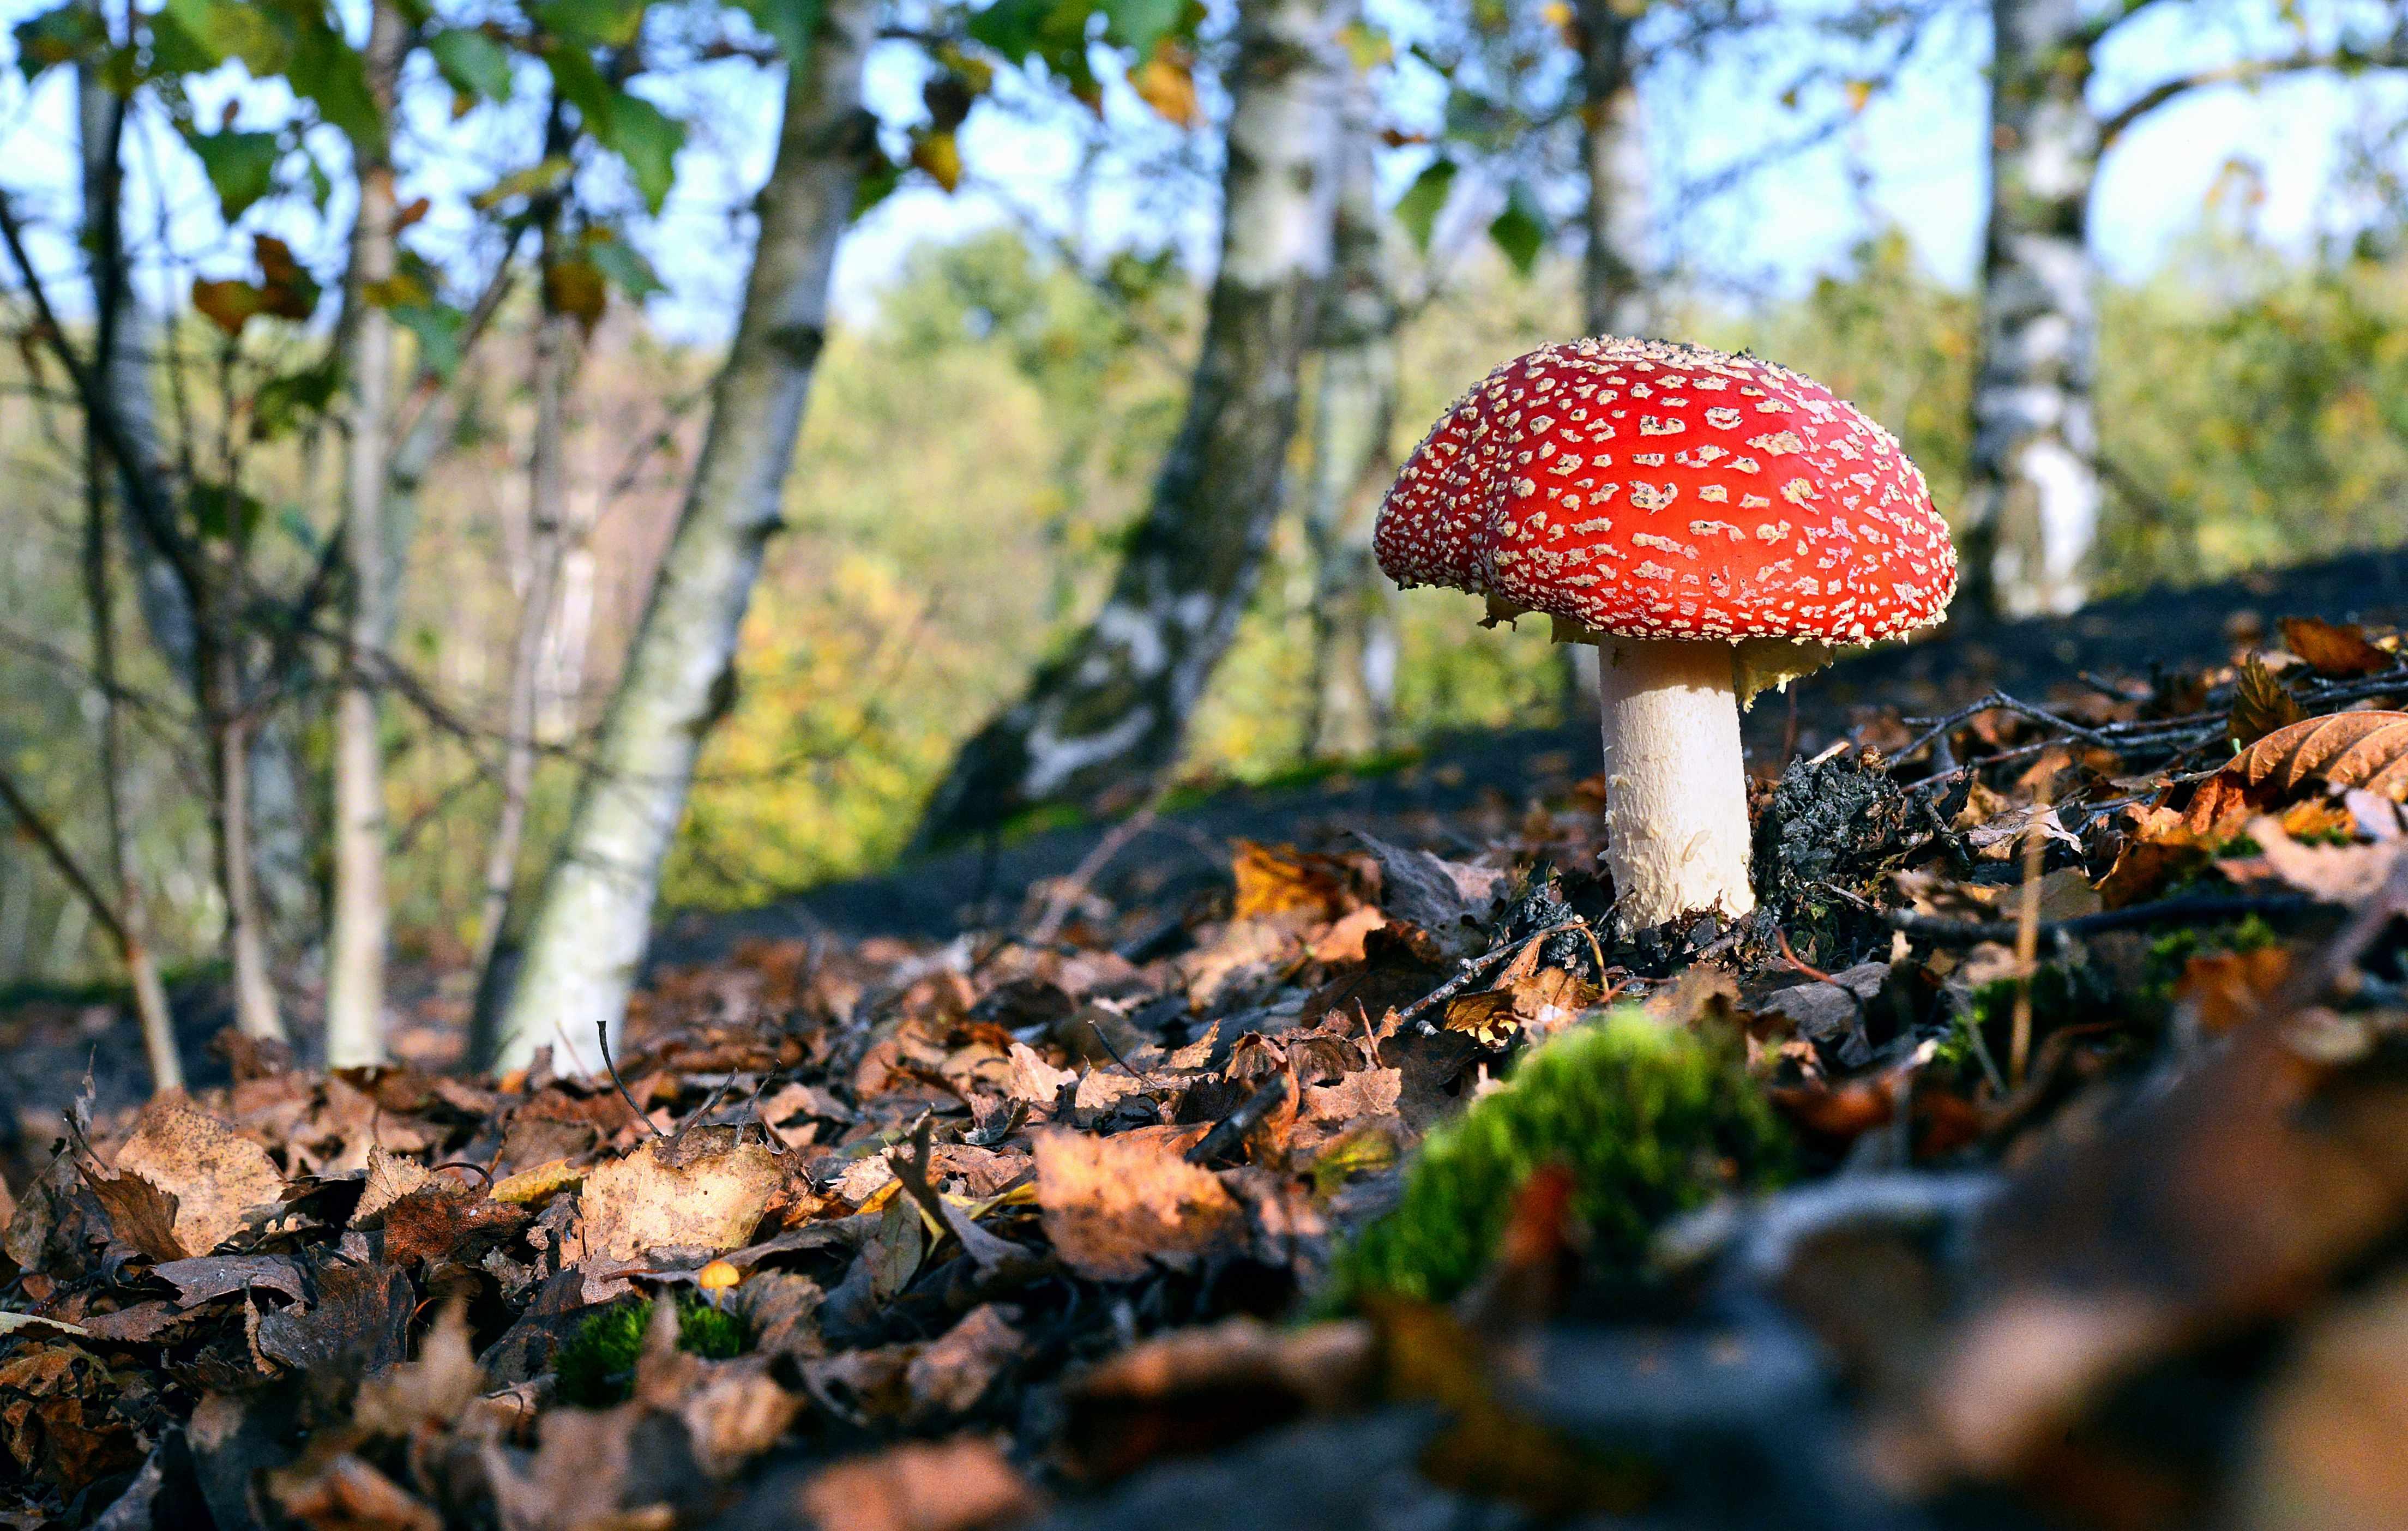 Fly agaric fungi. © Andia/UIG/Getty